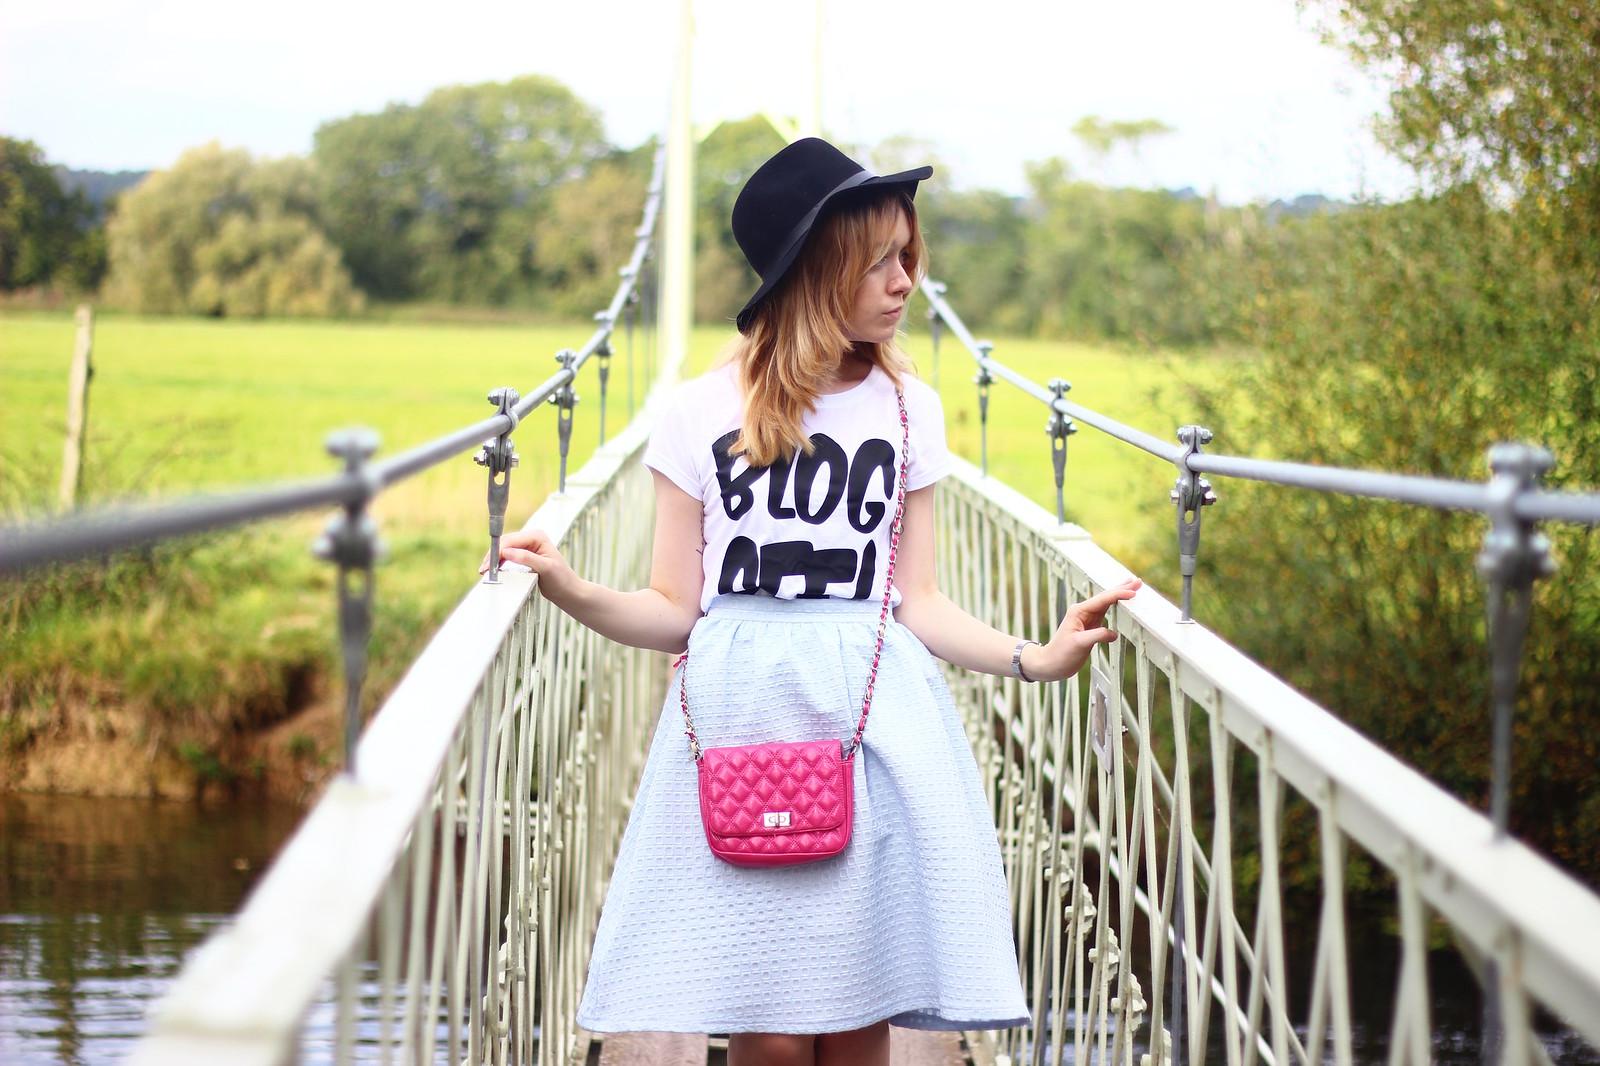 4bloggertshirt